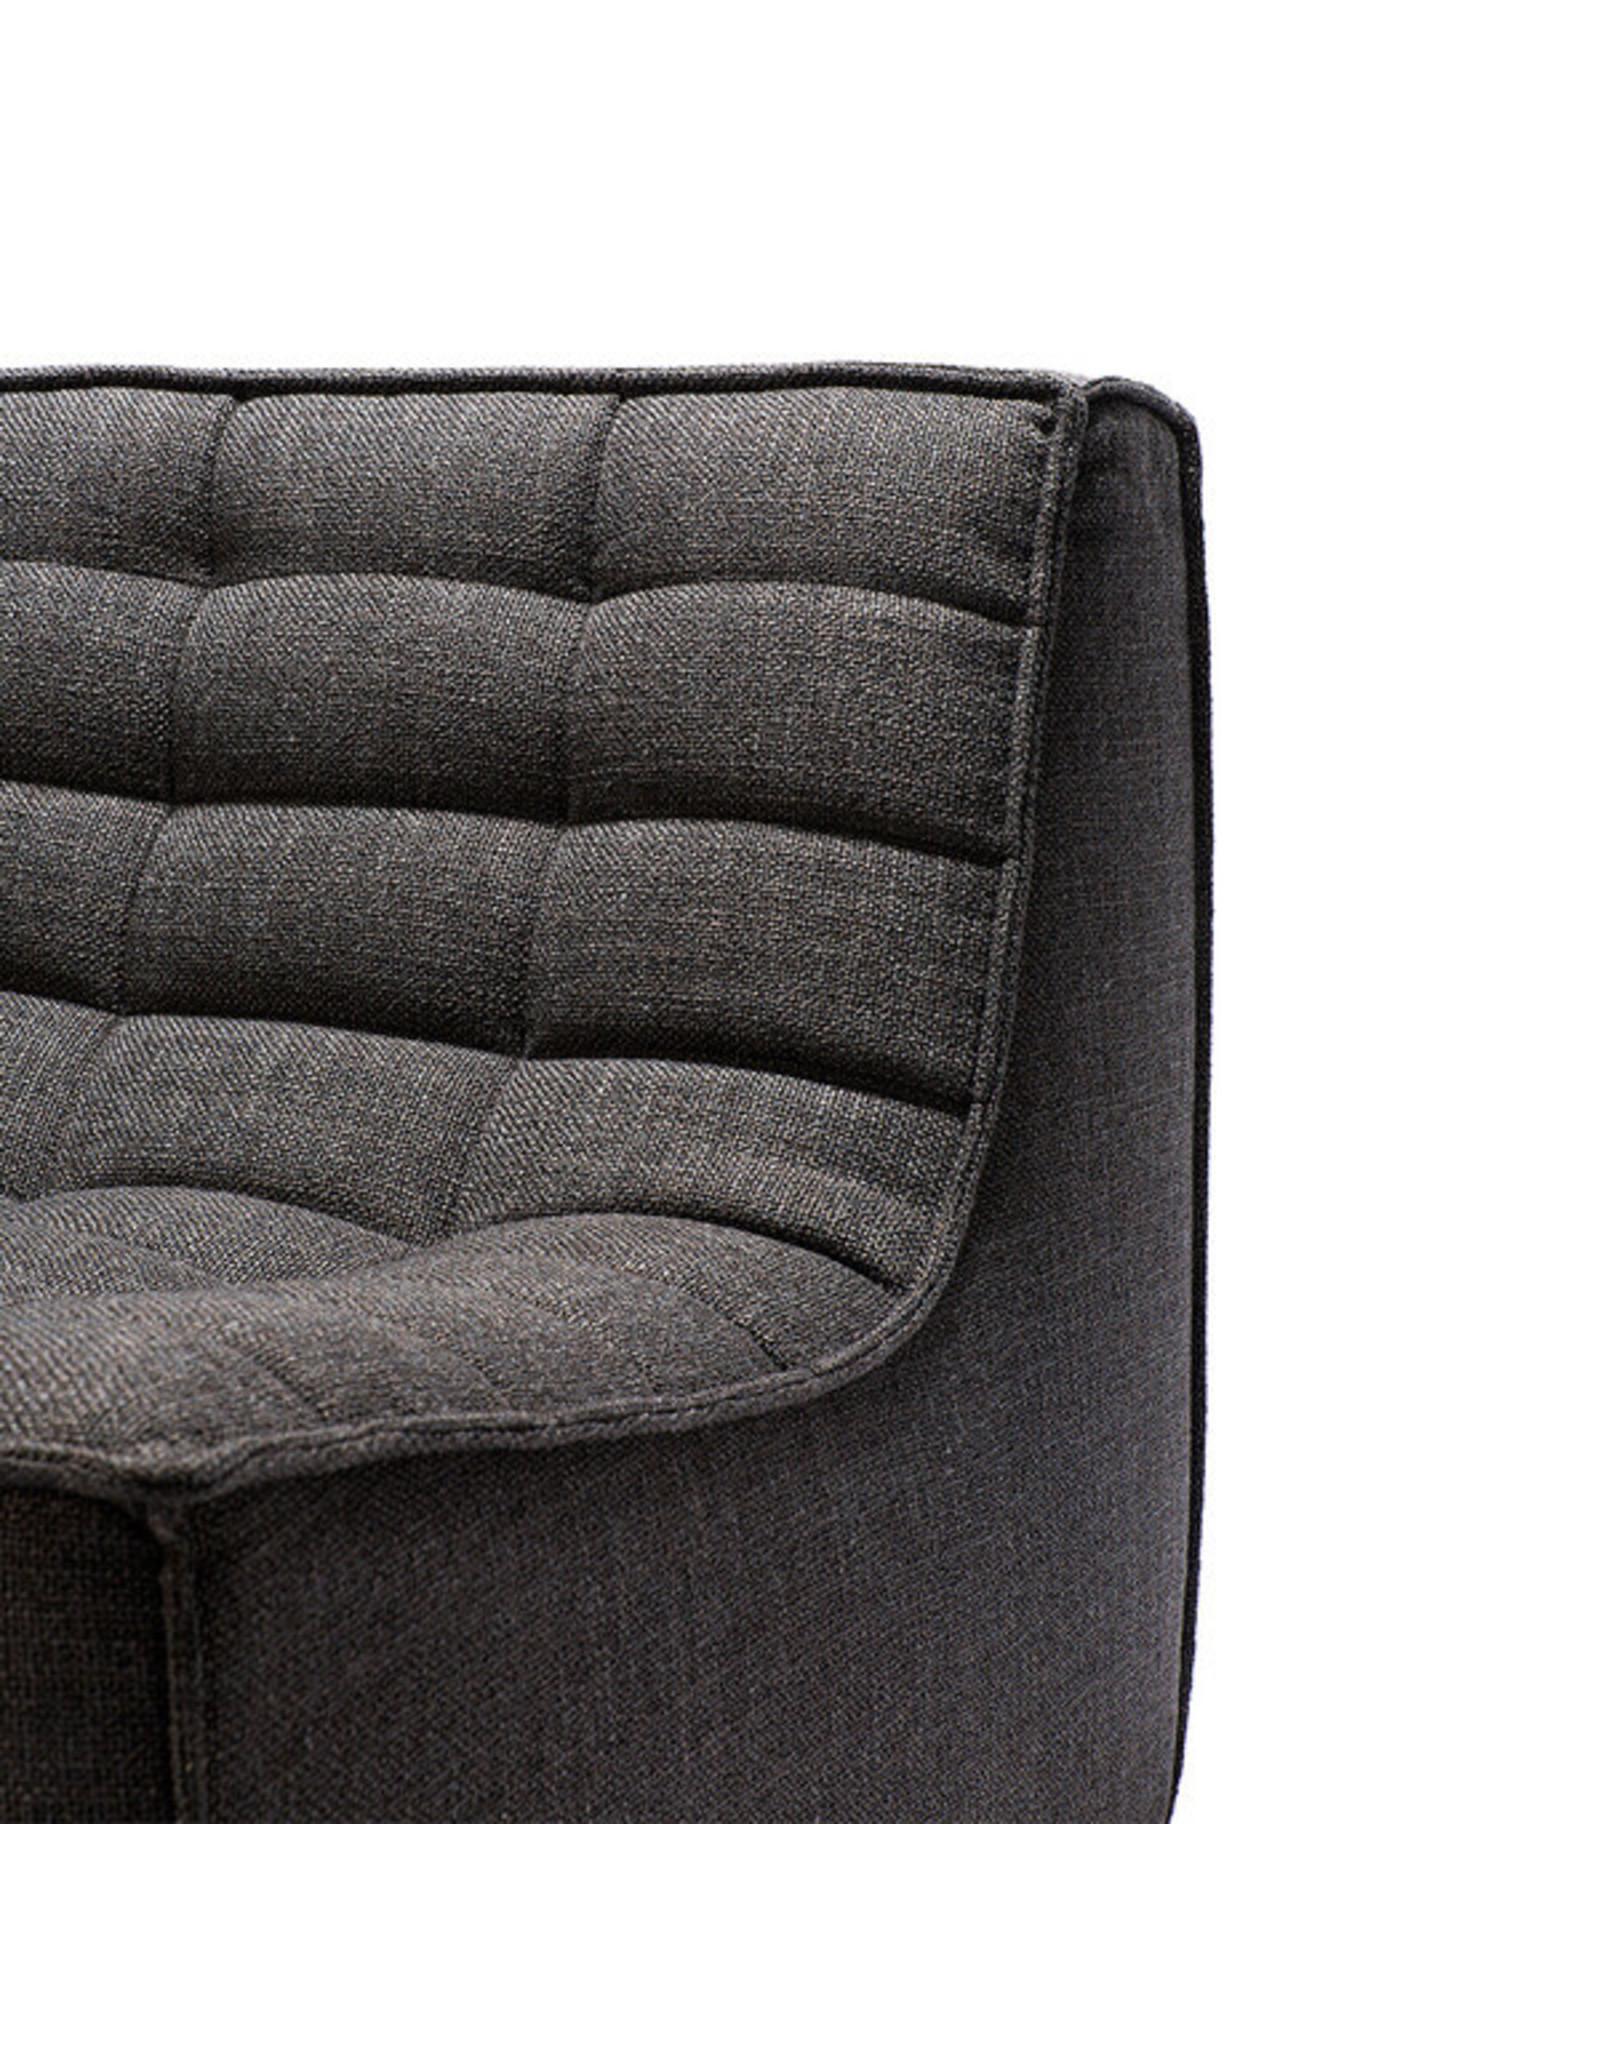 Ethnicraft N701 One Seater, Dark Grey